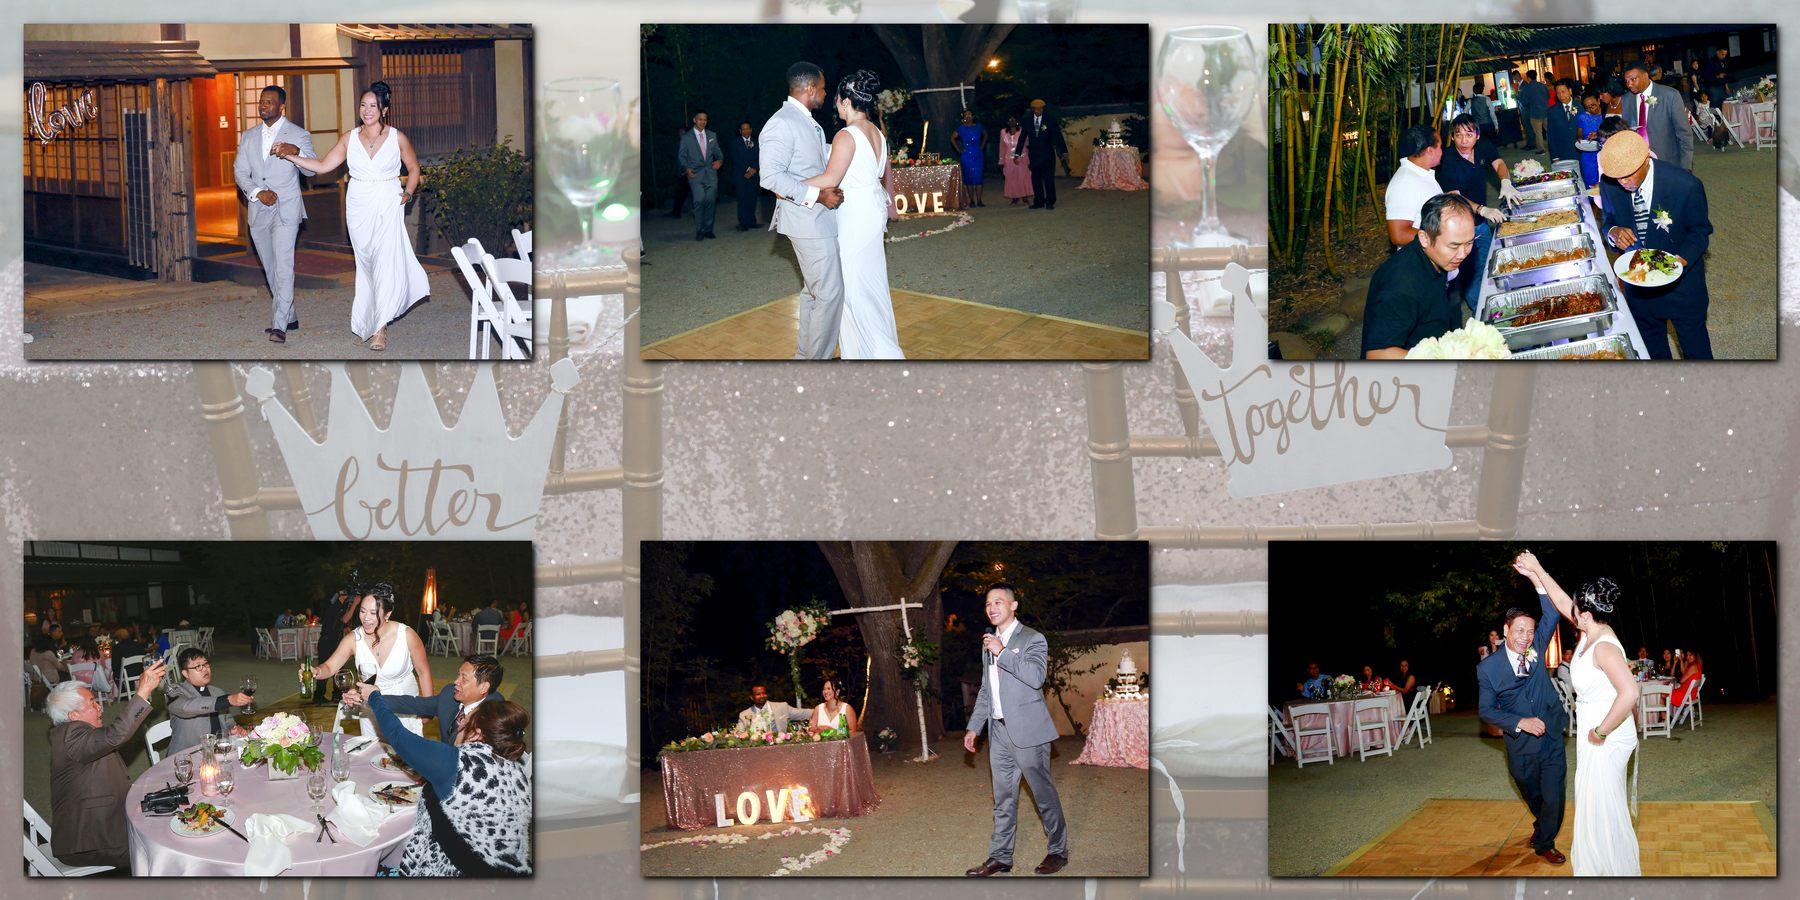 Keneisha wedding album 014 (Sides 26-27)